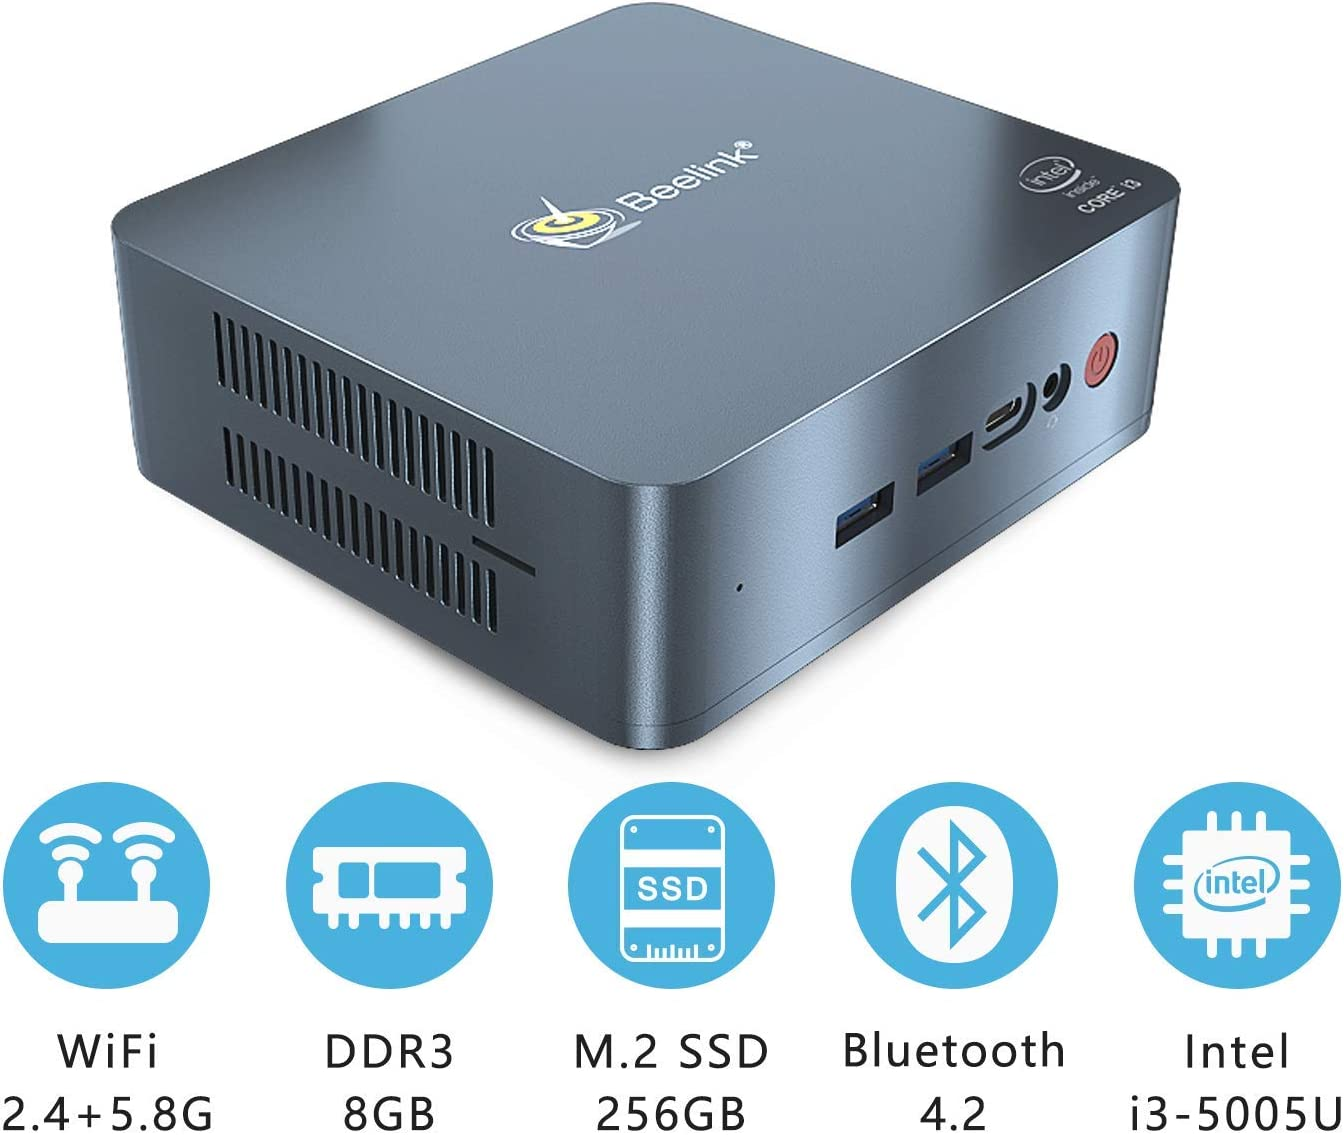 HSYPC Beelink L55 Mini PC, procesador Intel i3-5005U, 8 GB/256 GB ...